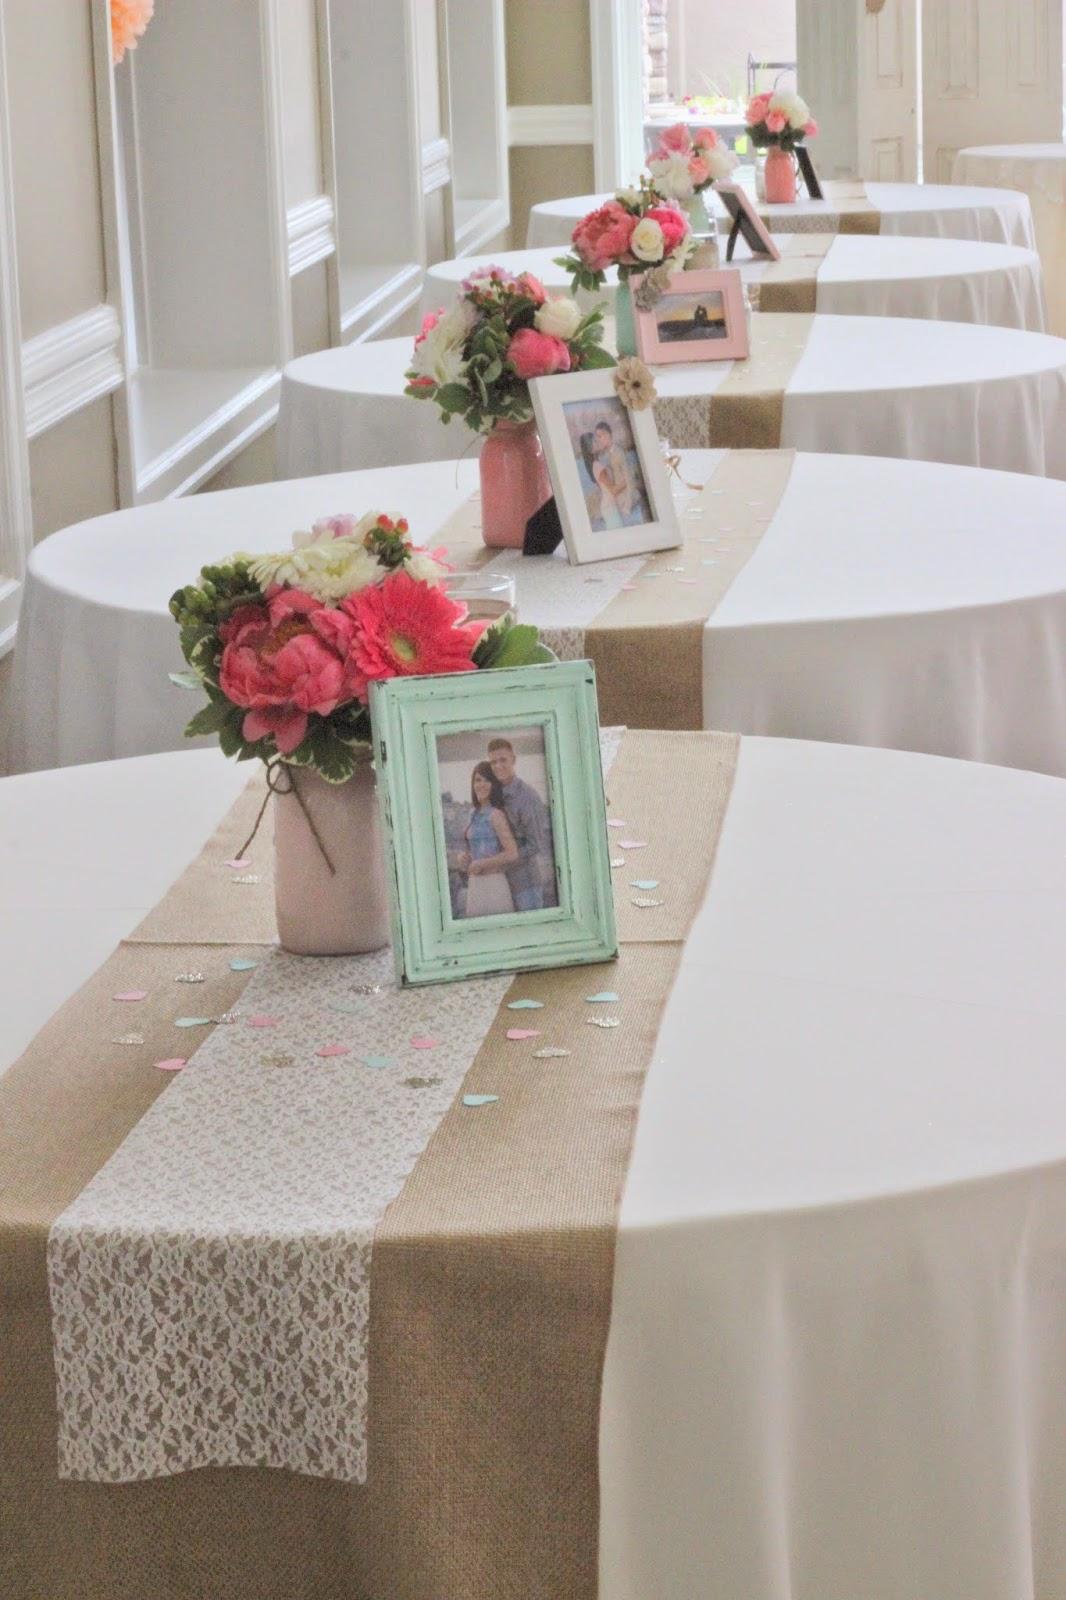 Wedding decorations on tables  Karina Rosas tchkarina on Pinterest